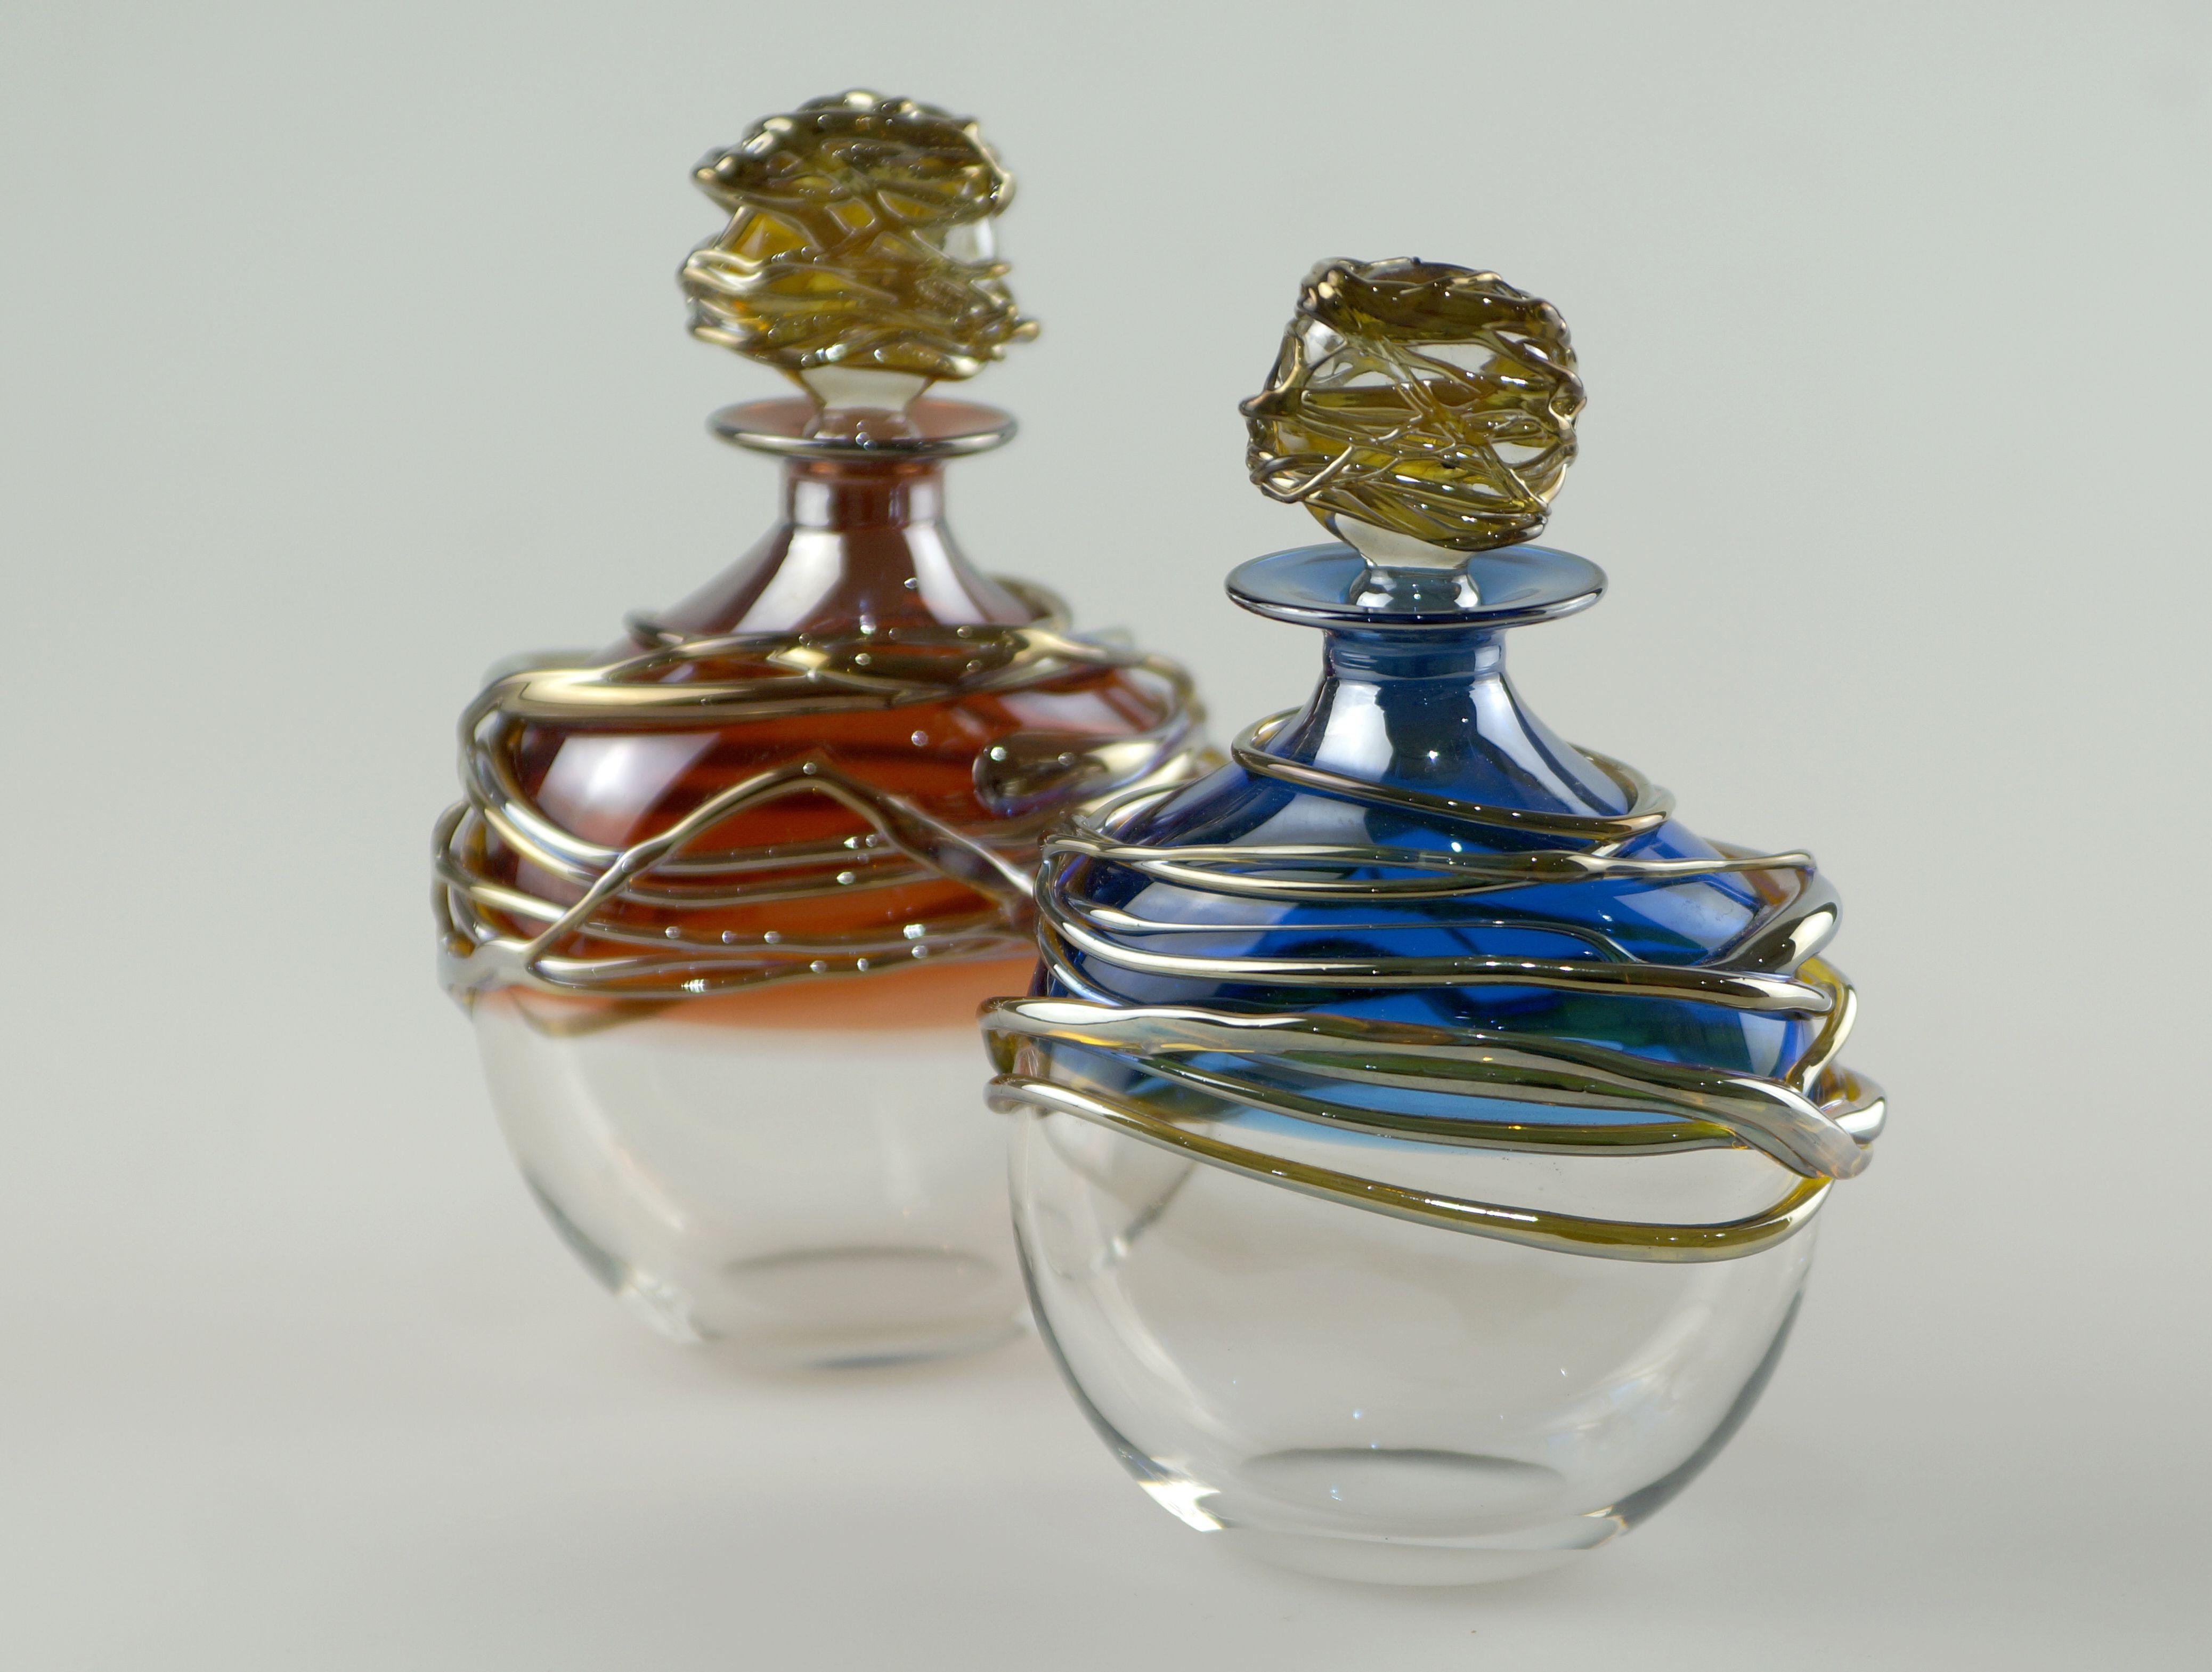 Allister Malcolm Golden Trailing Scent Bottle Glass